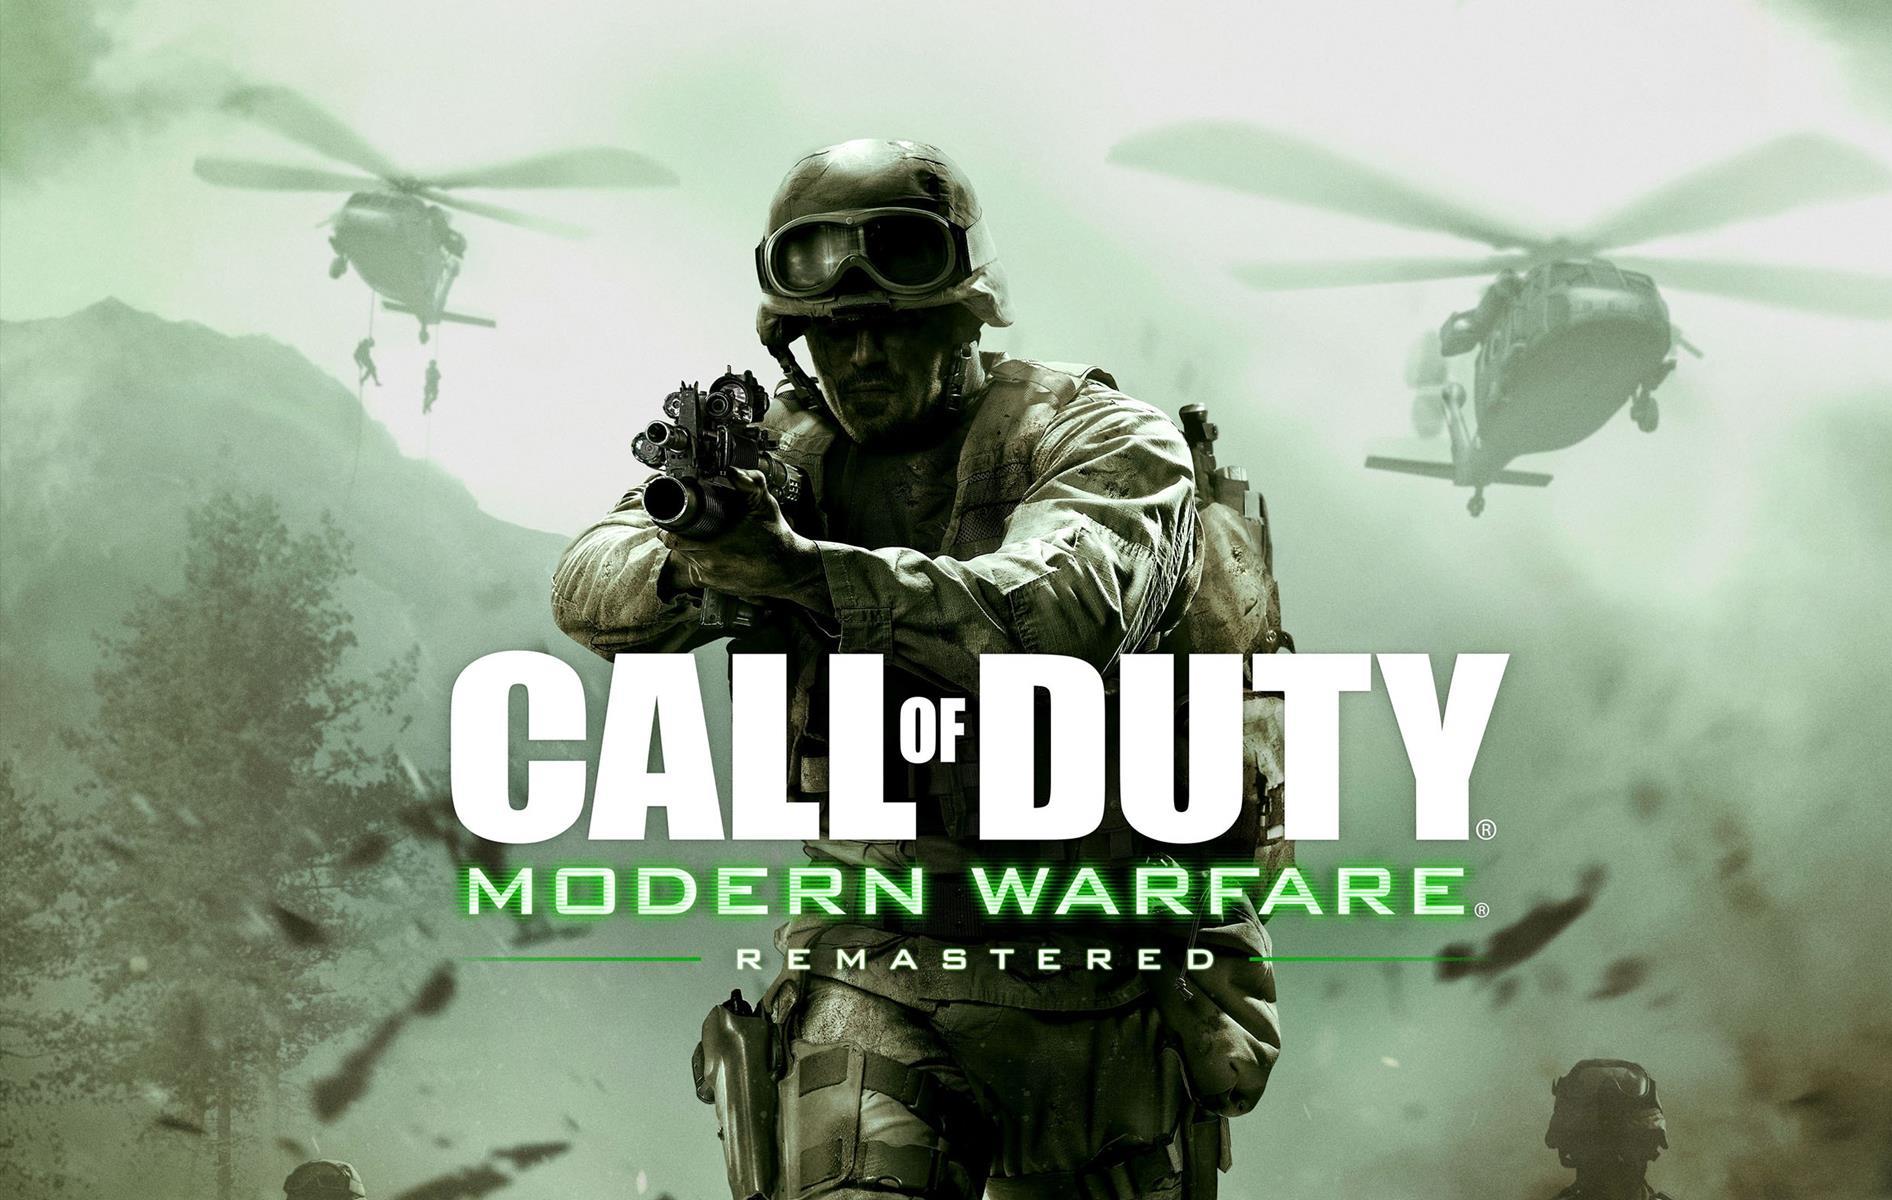 Call-of-Duty-Modern-Warfare-Remastered-1